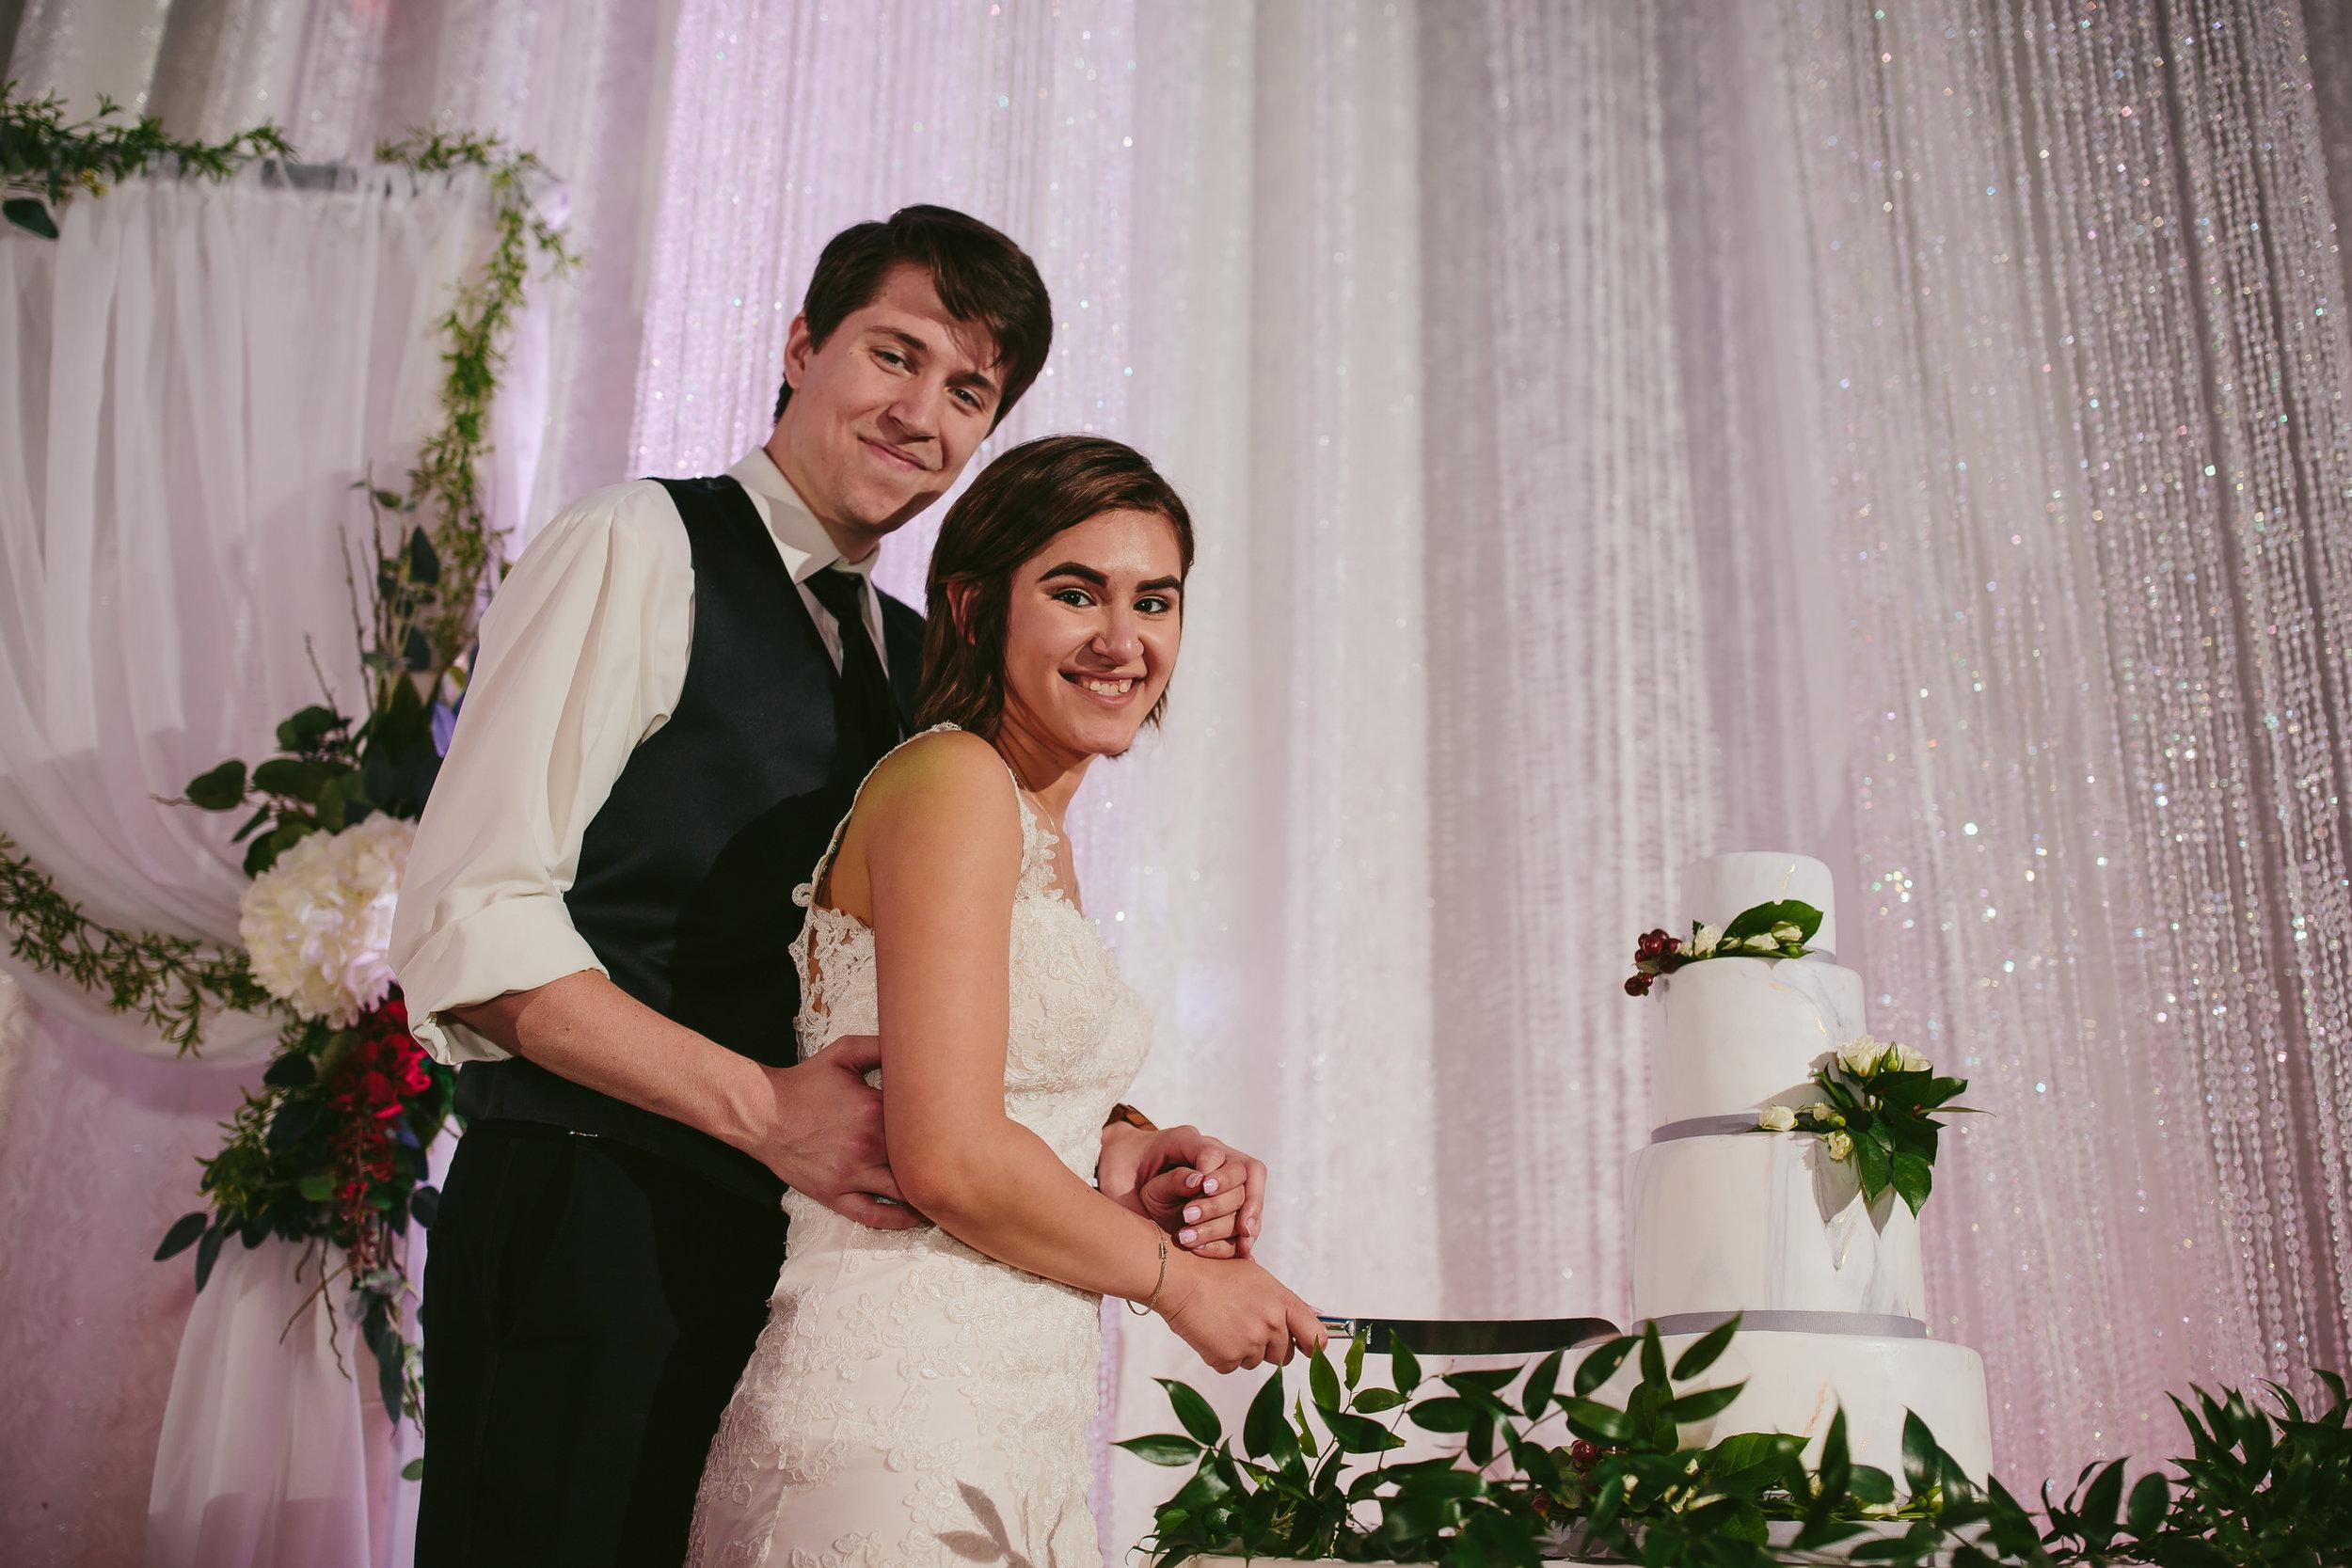 cut_the_cake_tiny_house_photo_fun_wedding_photography.jpg